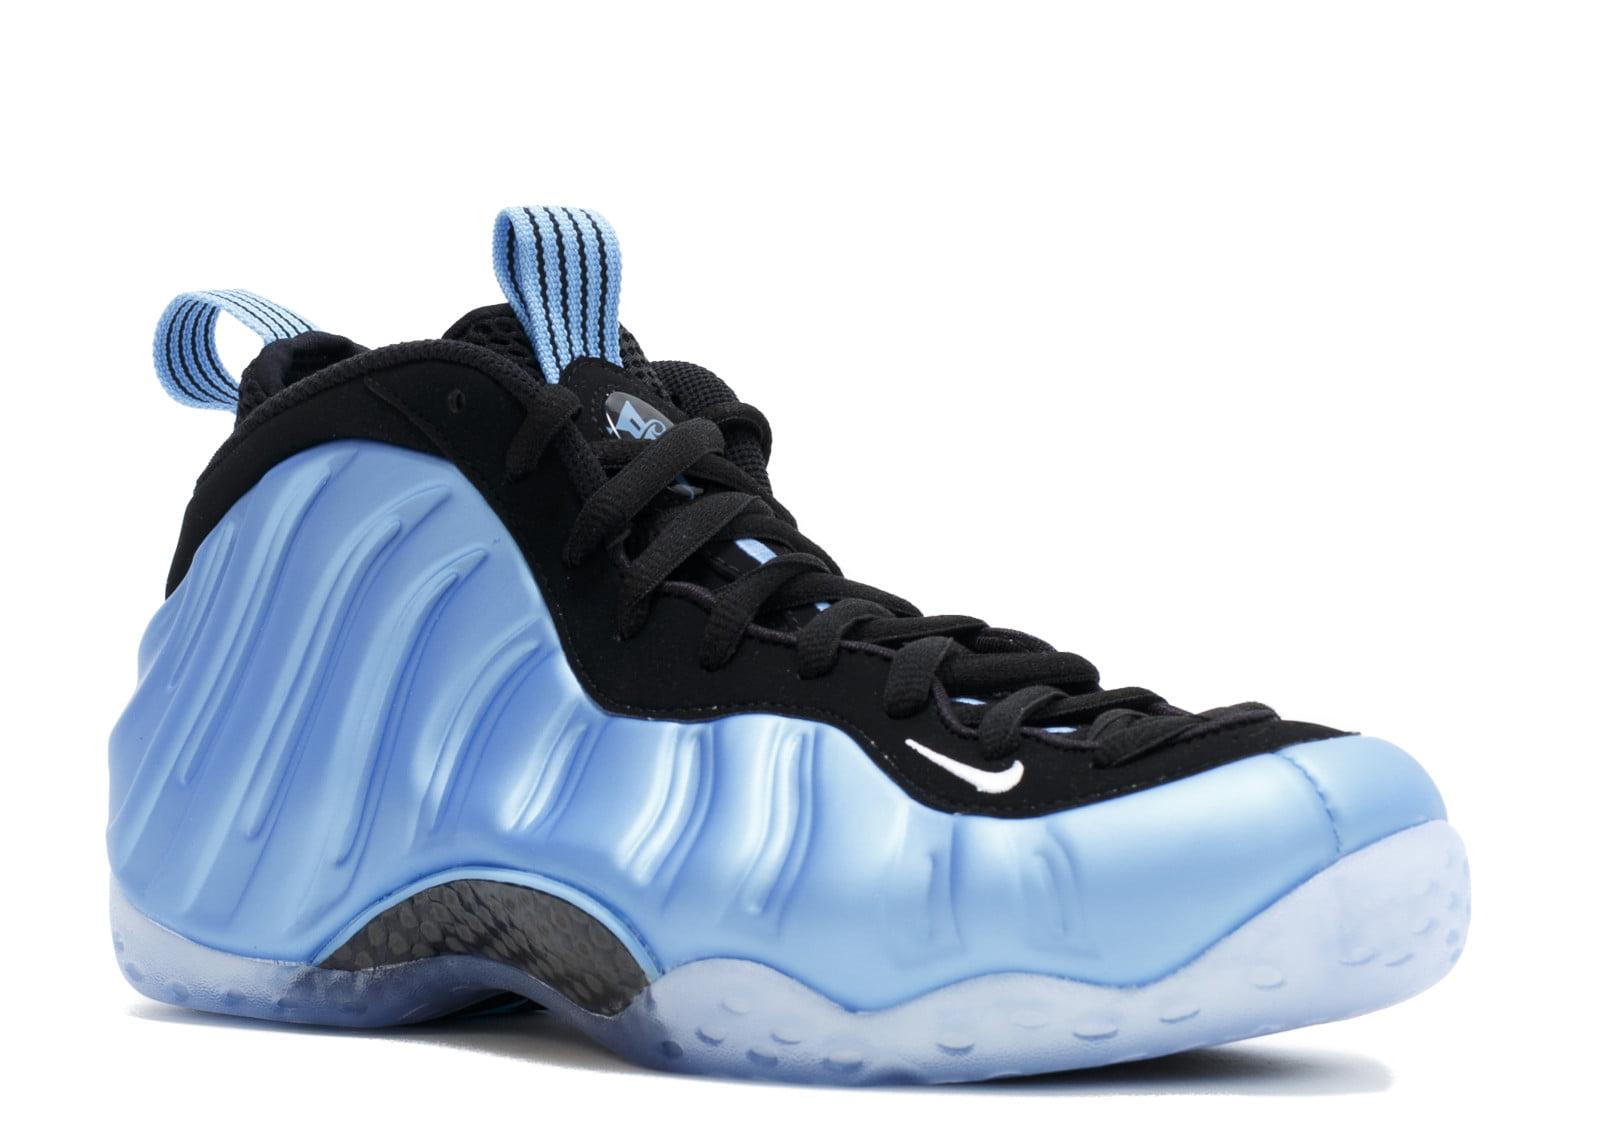 ada1c7e613c Nike - Men - Air Foamposite One  University Blue  - 314996-402 - Size 11.5